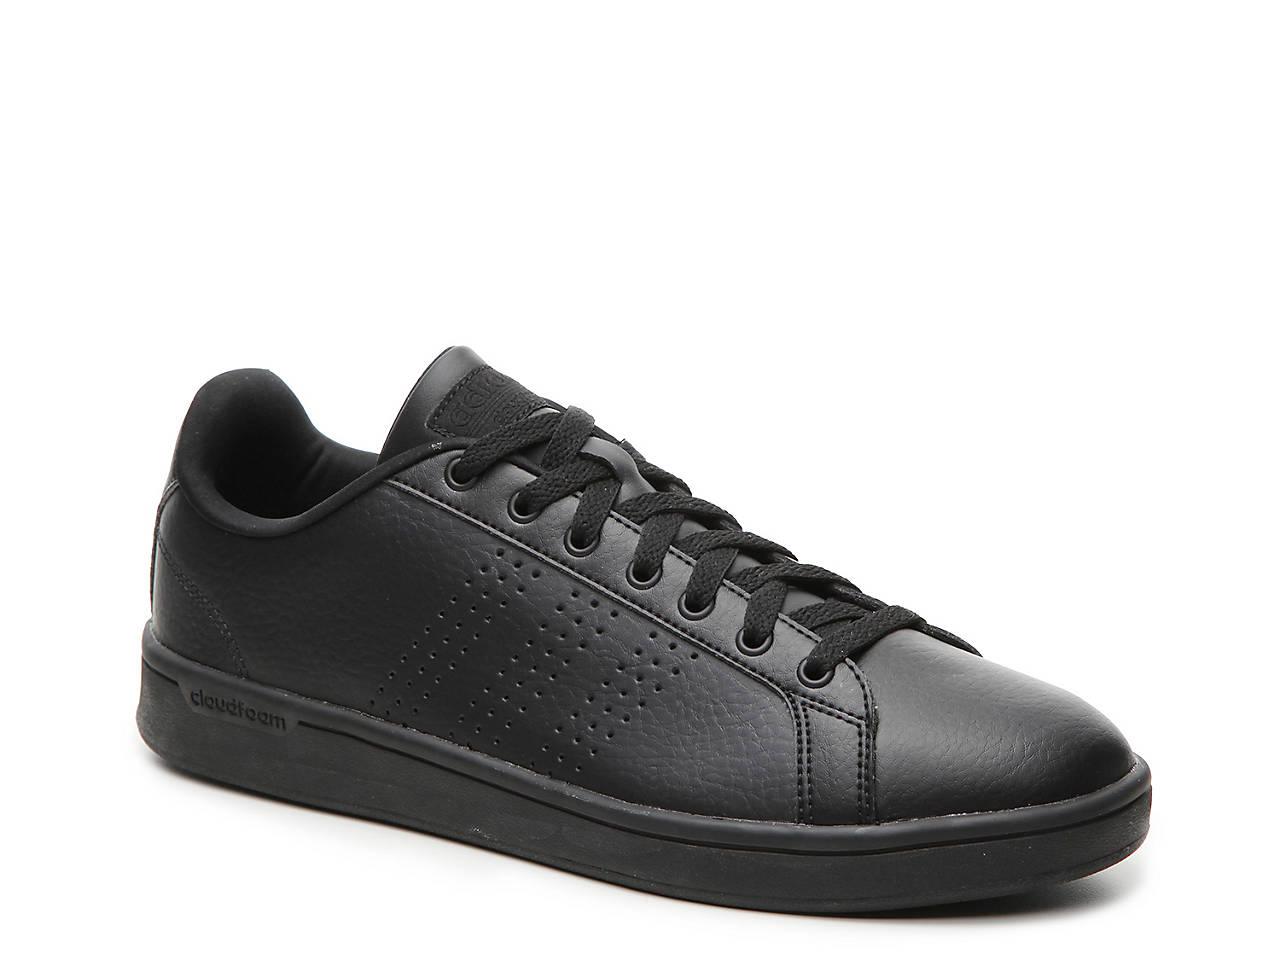 grand choix de 03cac 655bd Advantage Clean Sneaker - Men's